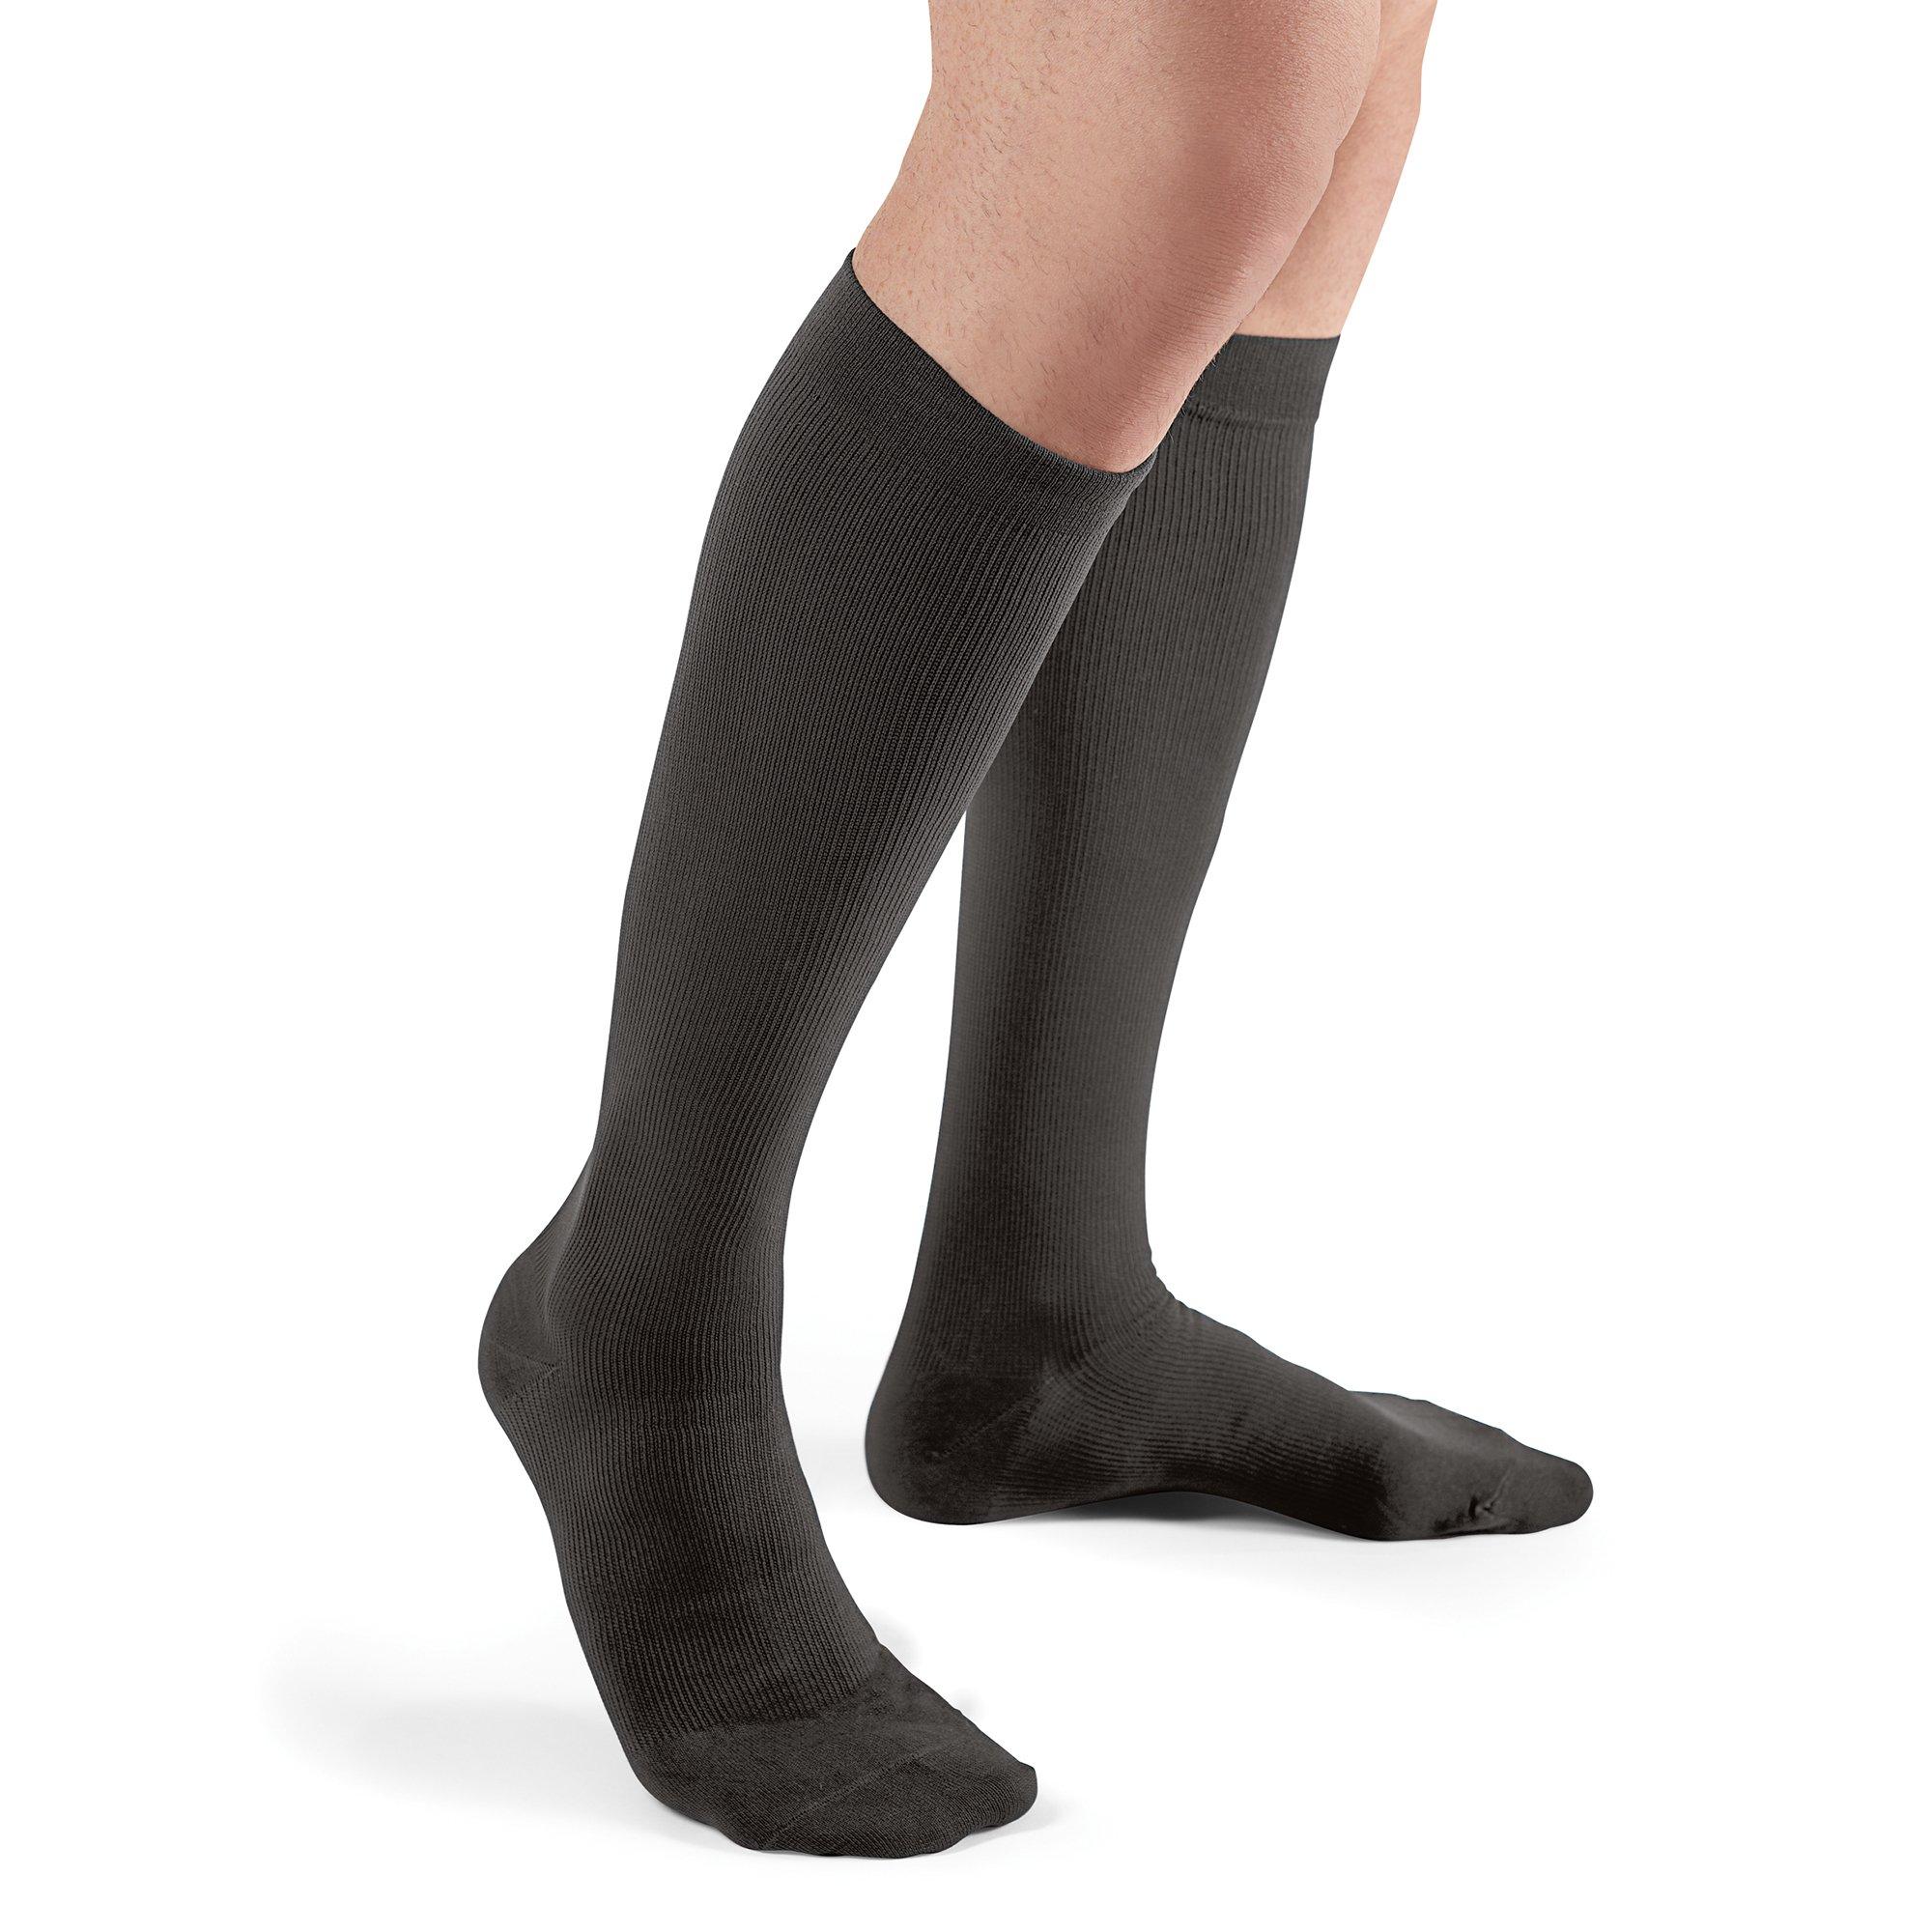 444cf75f79c0 Get Quotations · Futuro Restoring Dress Socks for Men, Firm Compression,  Over the Calf, X-